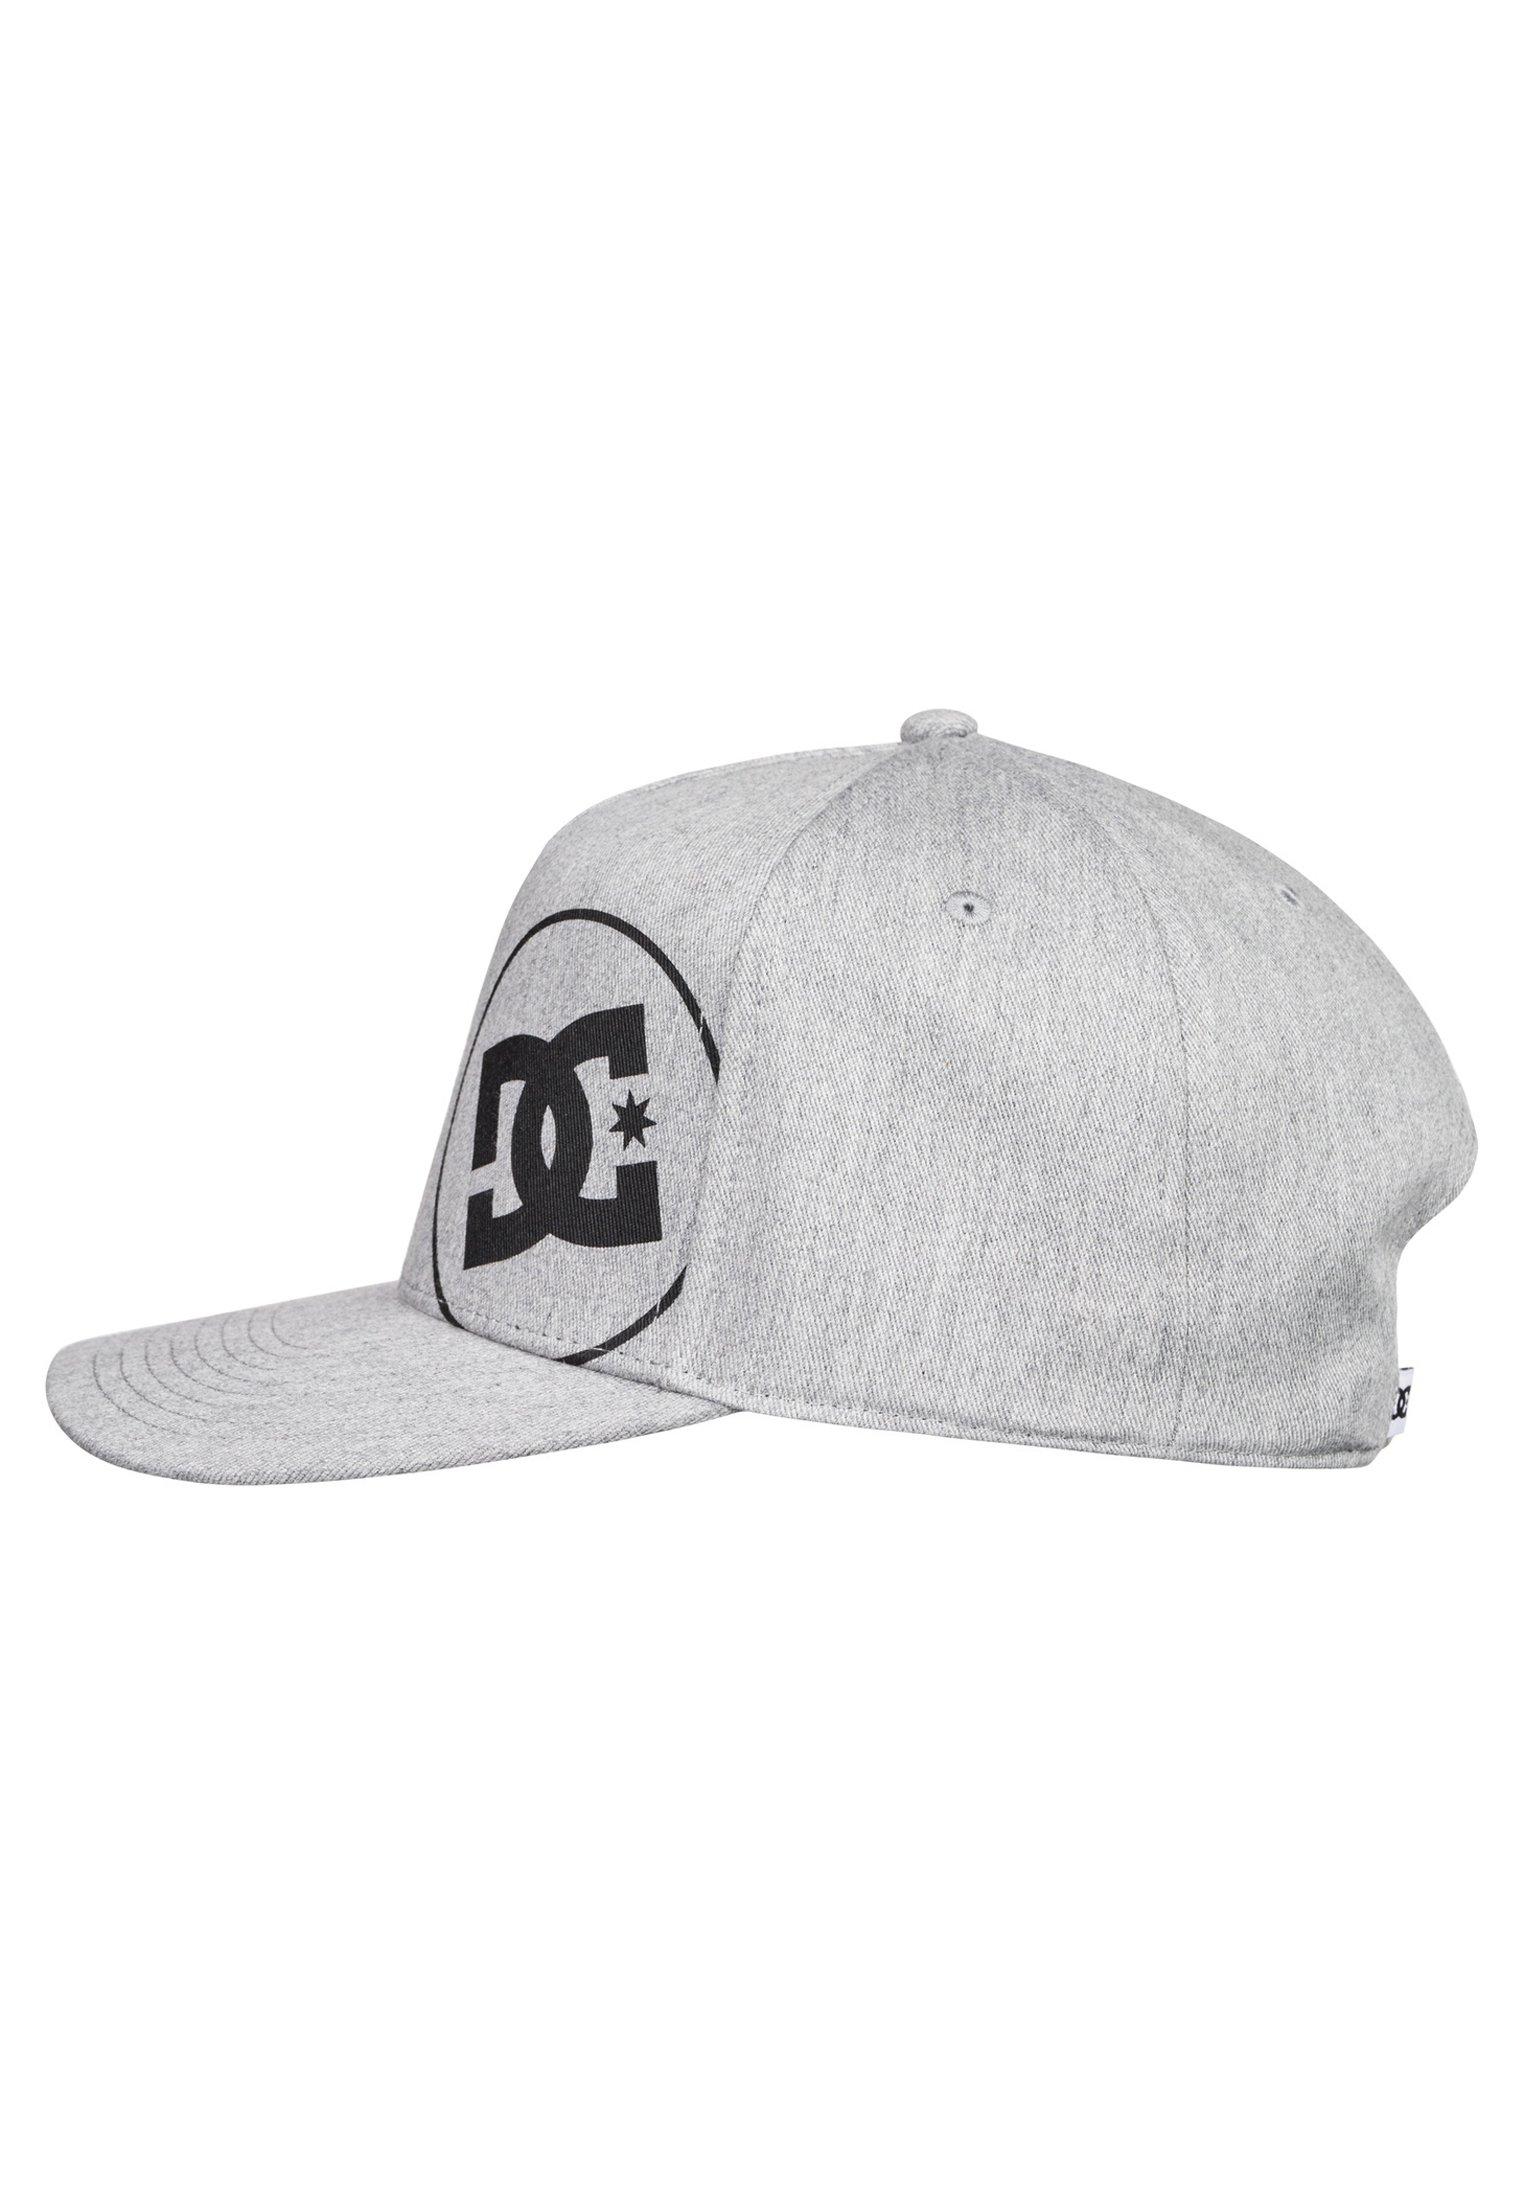 Dc Shoes Whynotts - Cap Grey/schwarz